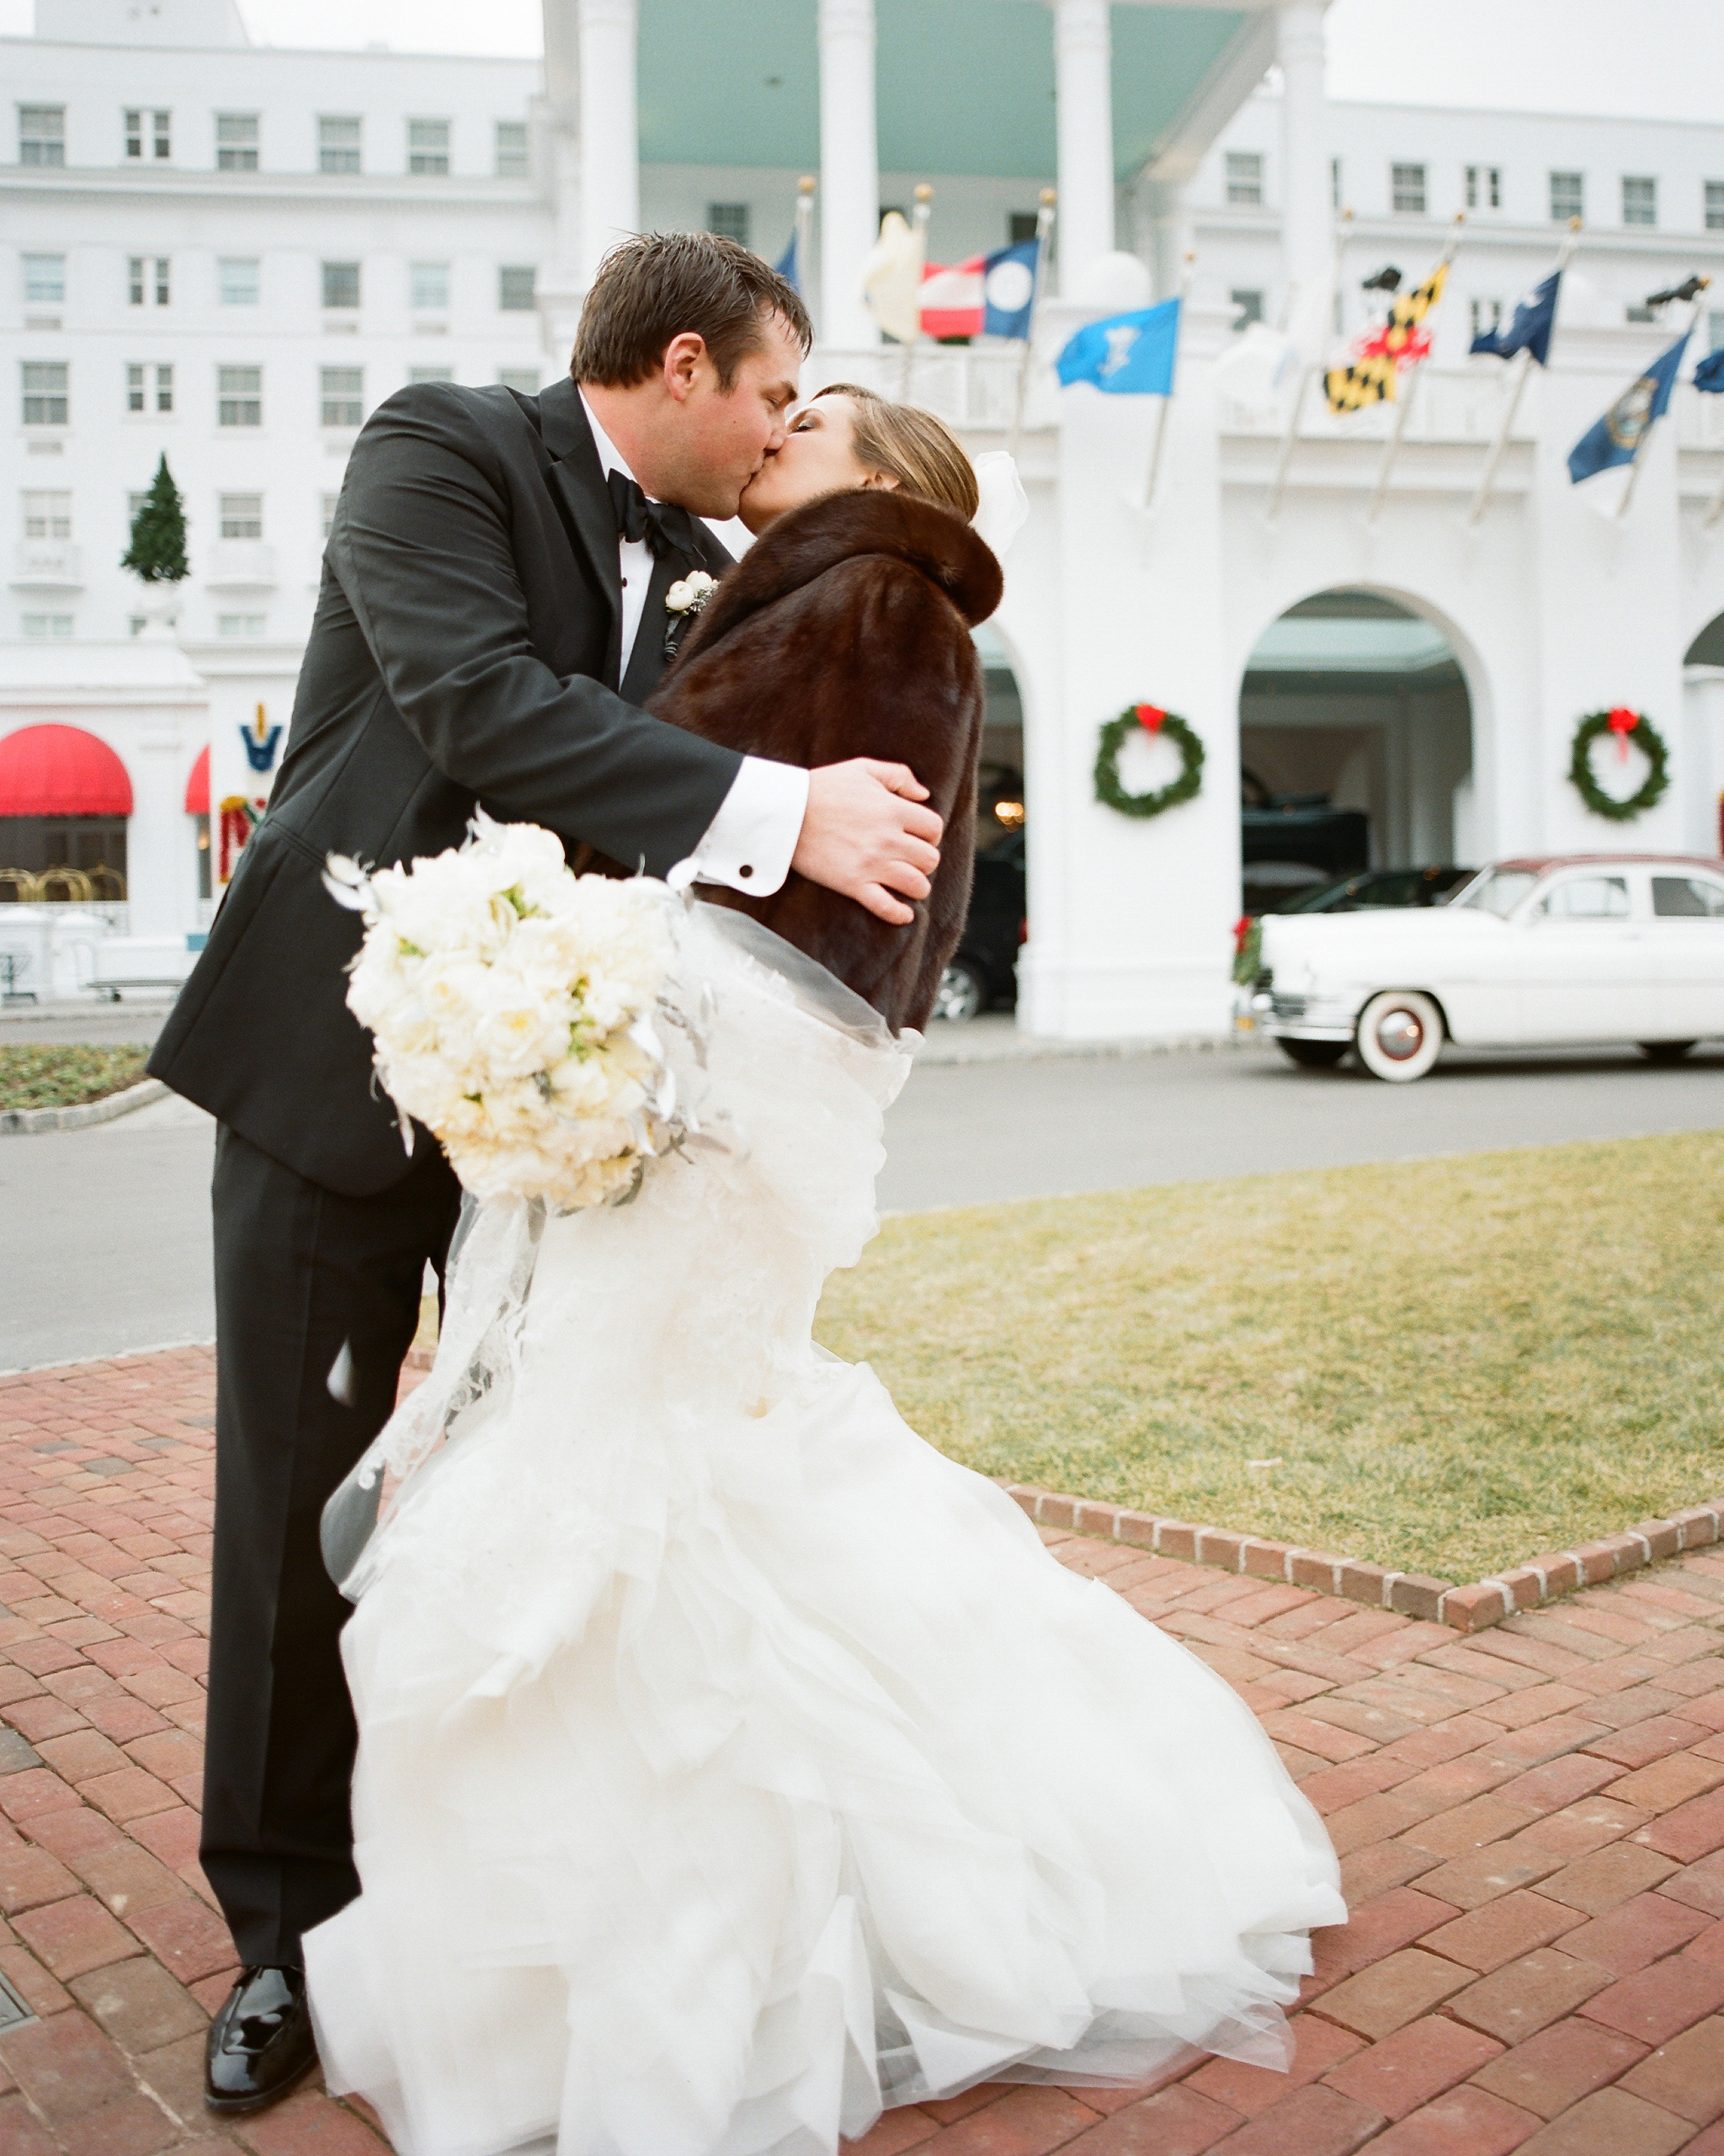 paige-michael-wedding-couple-0803-s112431-1215.jpg